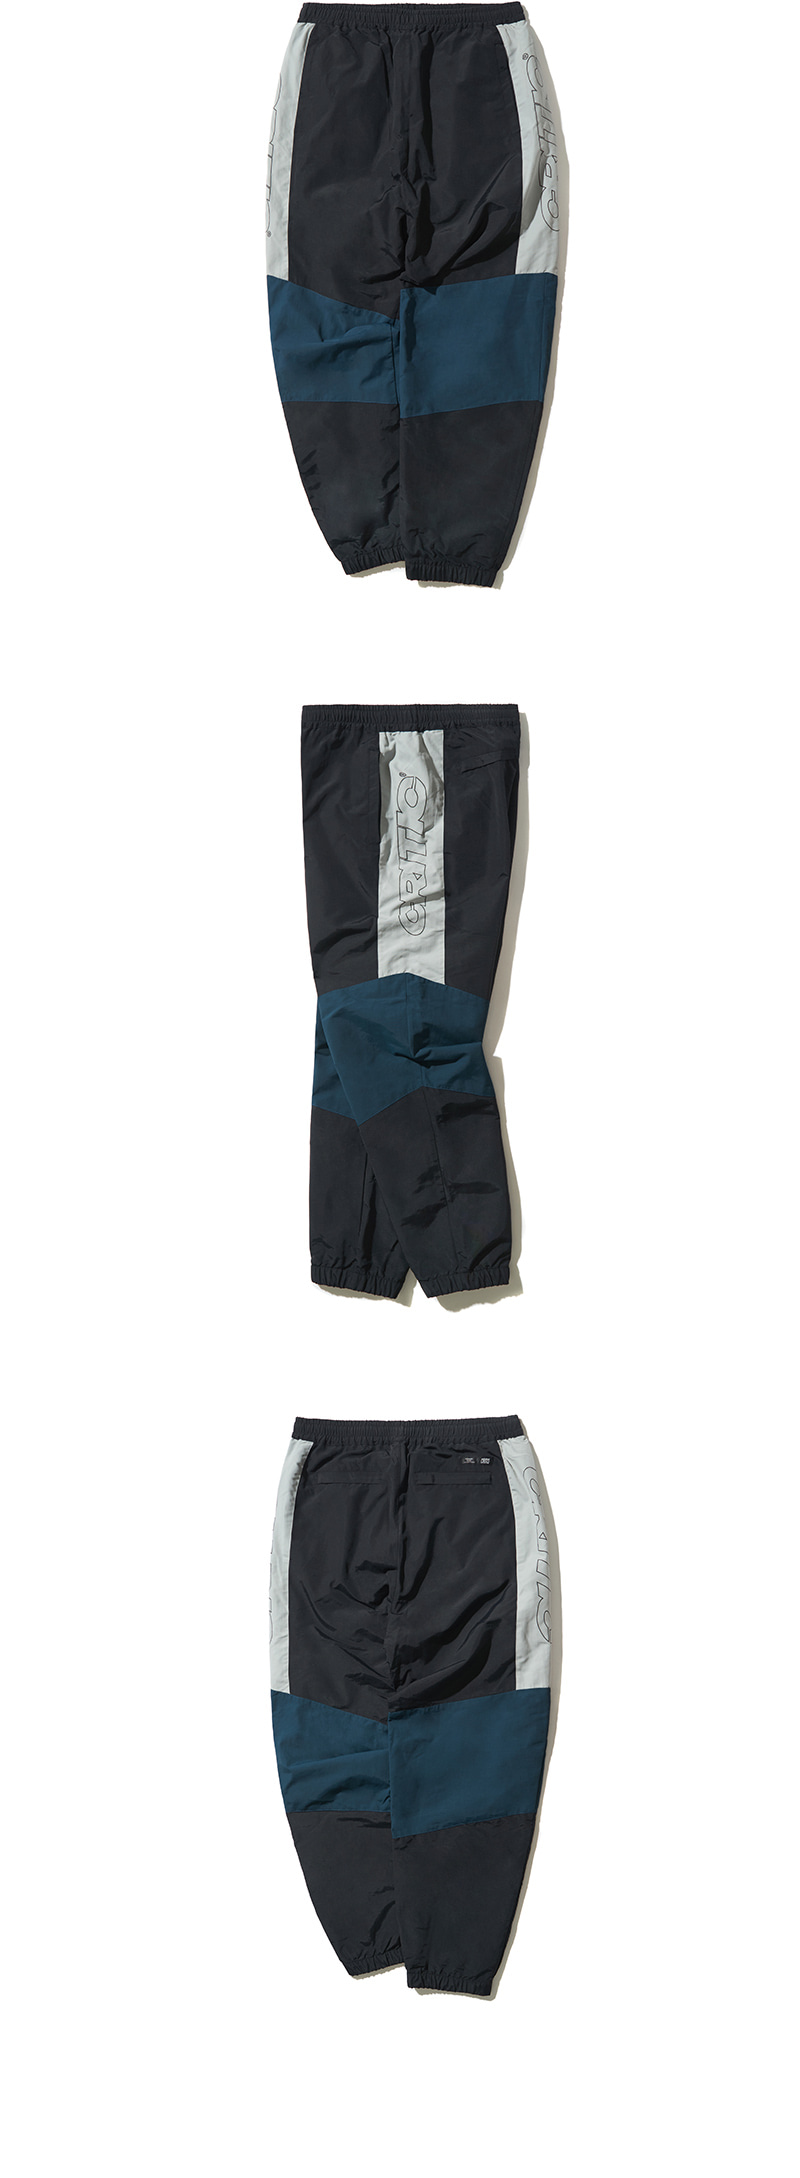 SIDE LOGO TRACK PANTS(BLACK)_CTONAPT01UC6